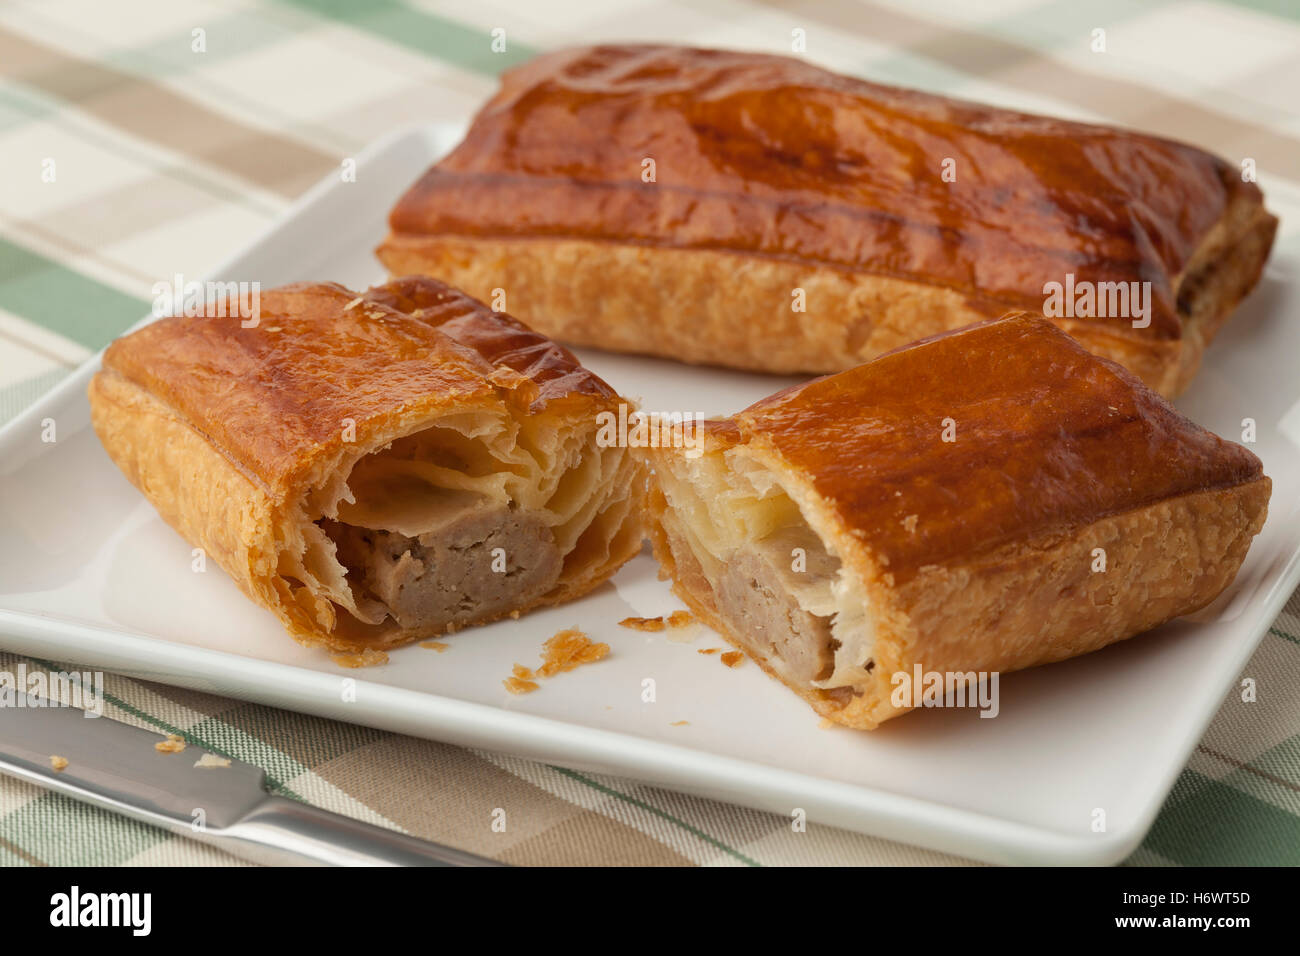 Fresh baked half sausage roll - Stock Image